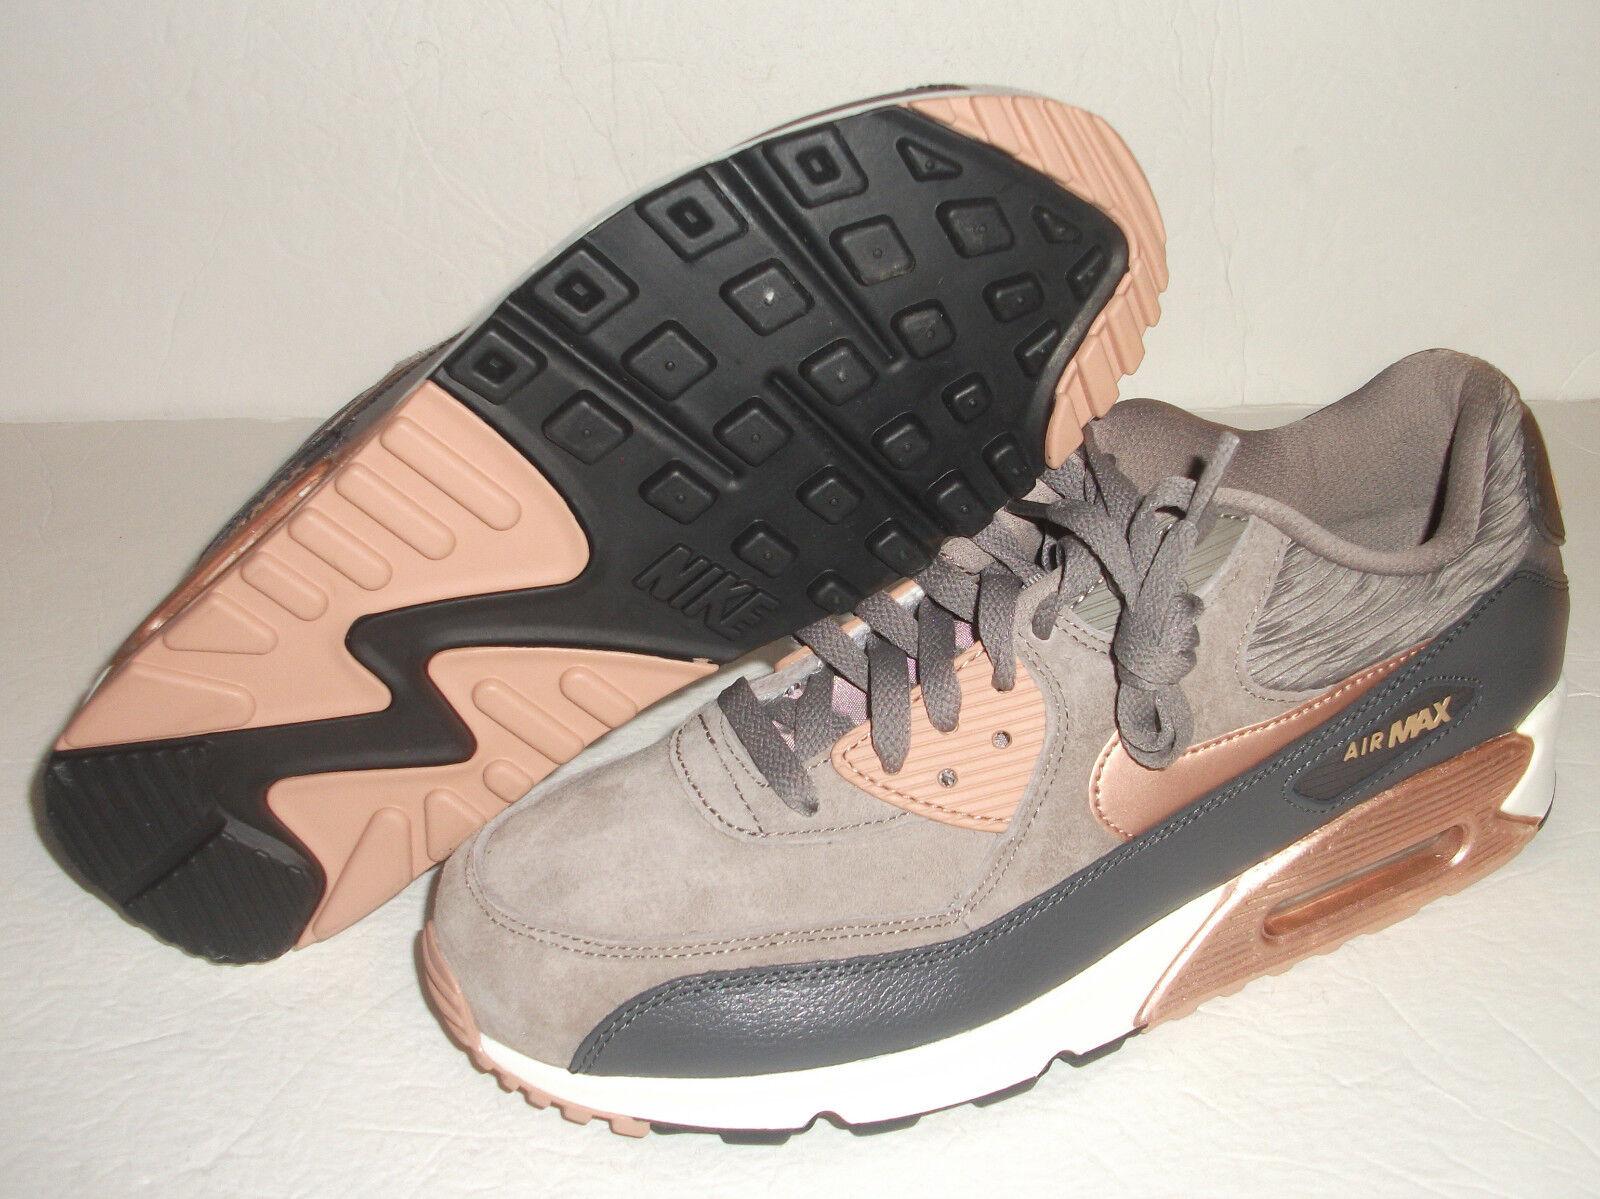 New Nike Air Max 90 Leather Running, Women's Size 11, Iron Metallic, 768887-201